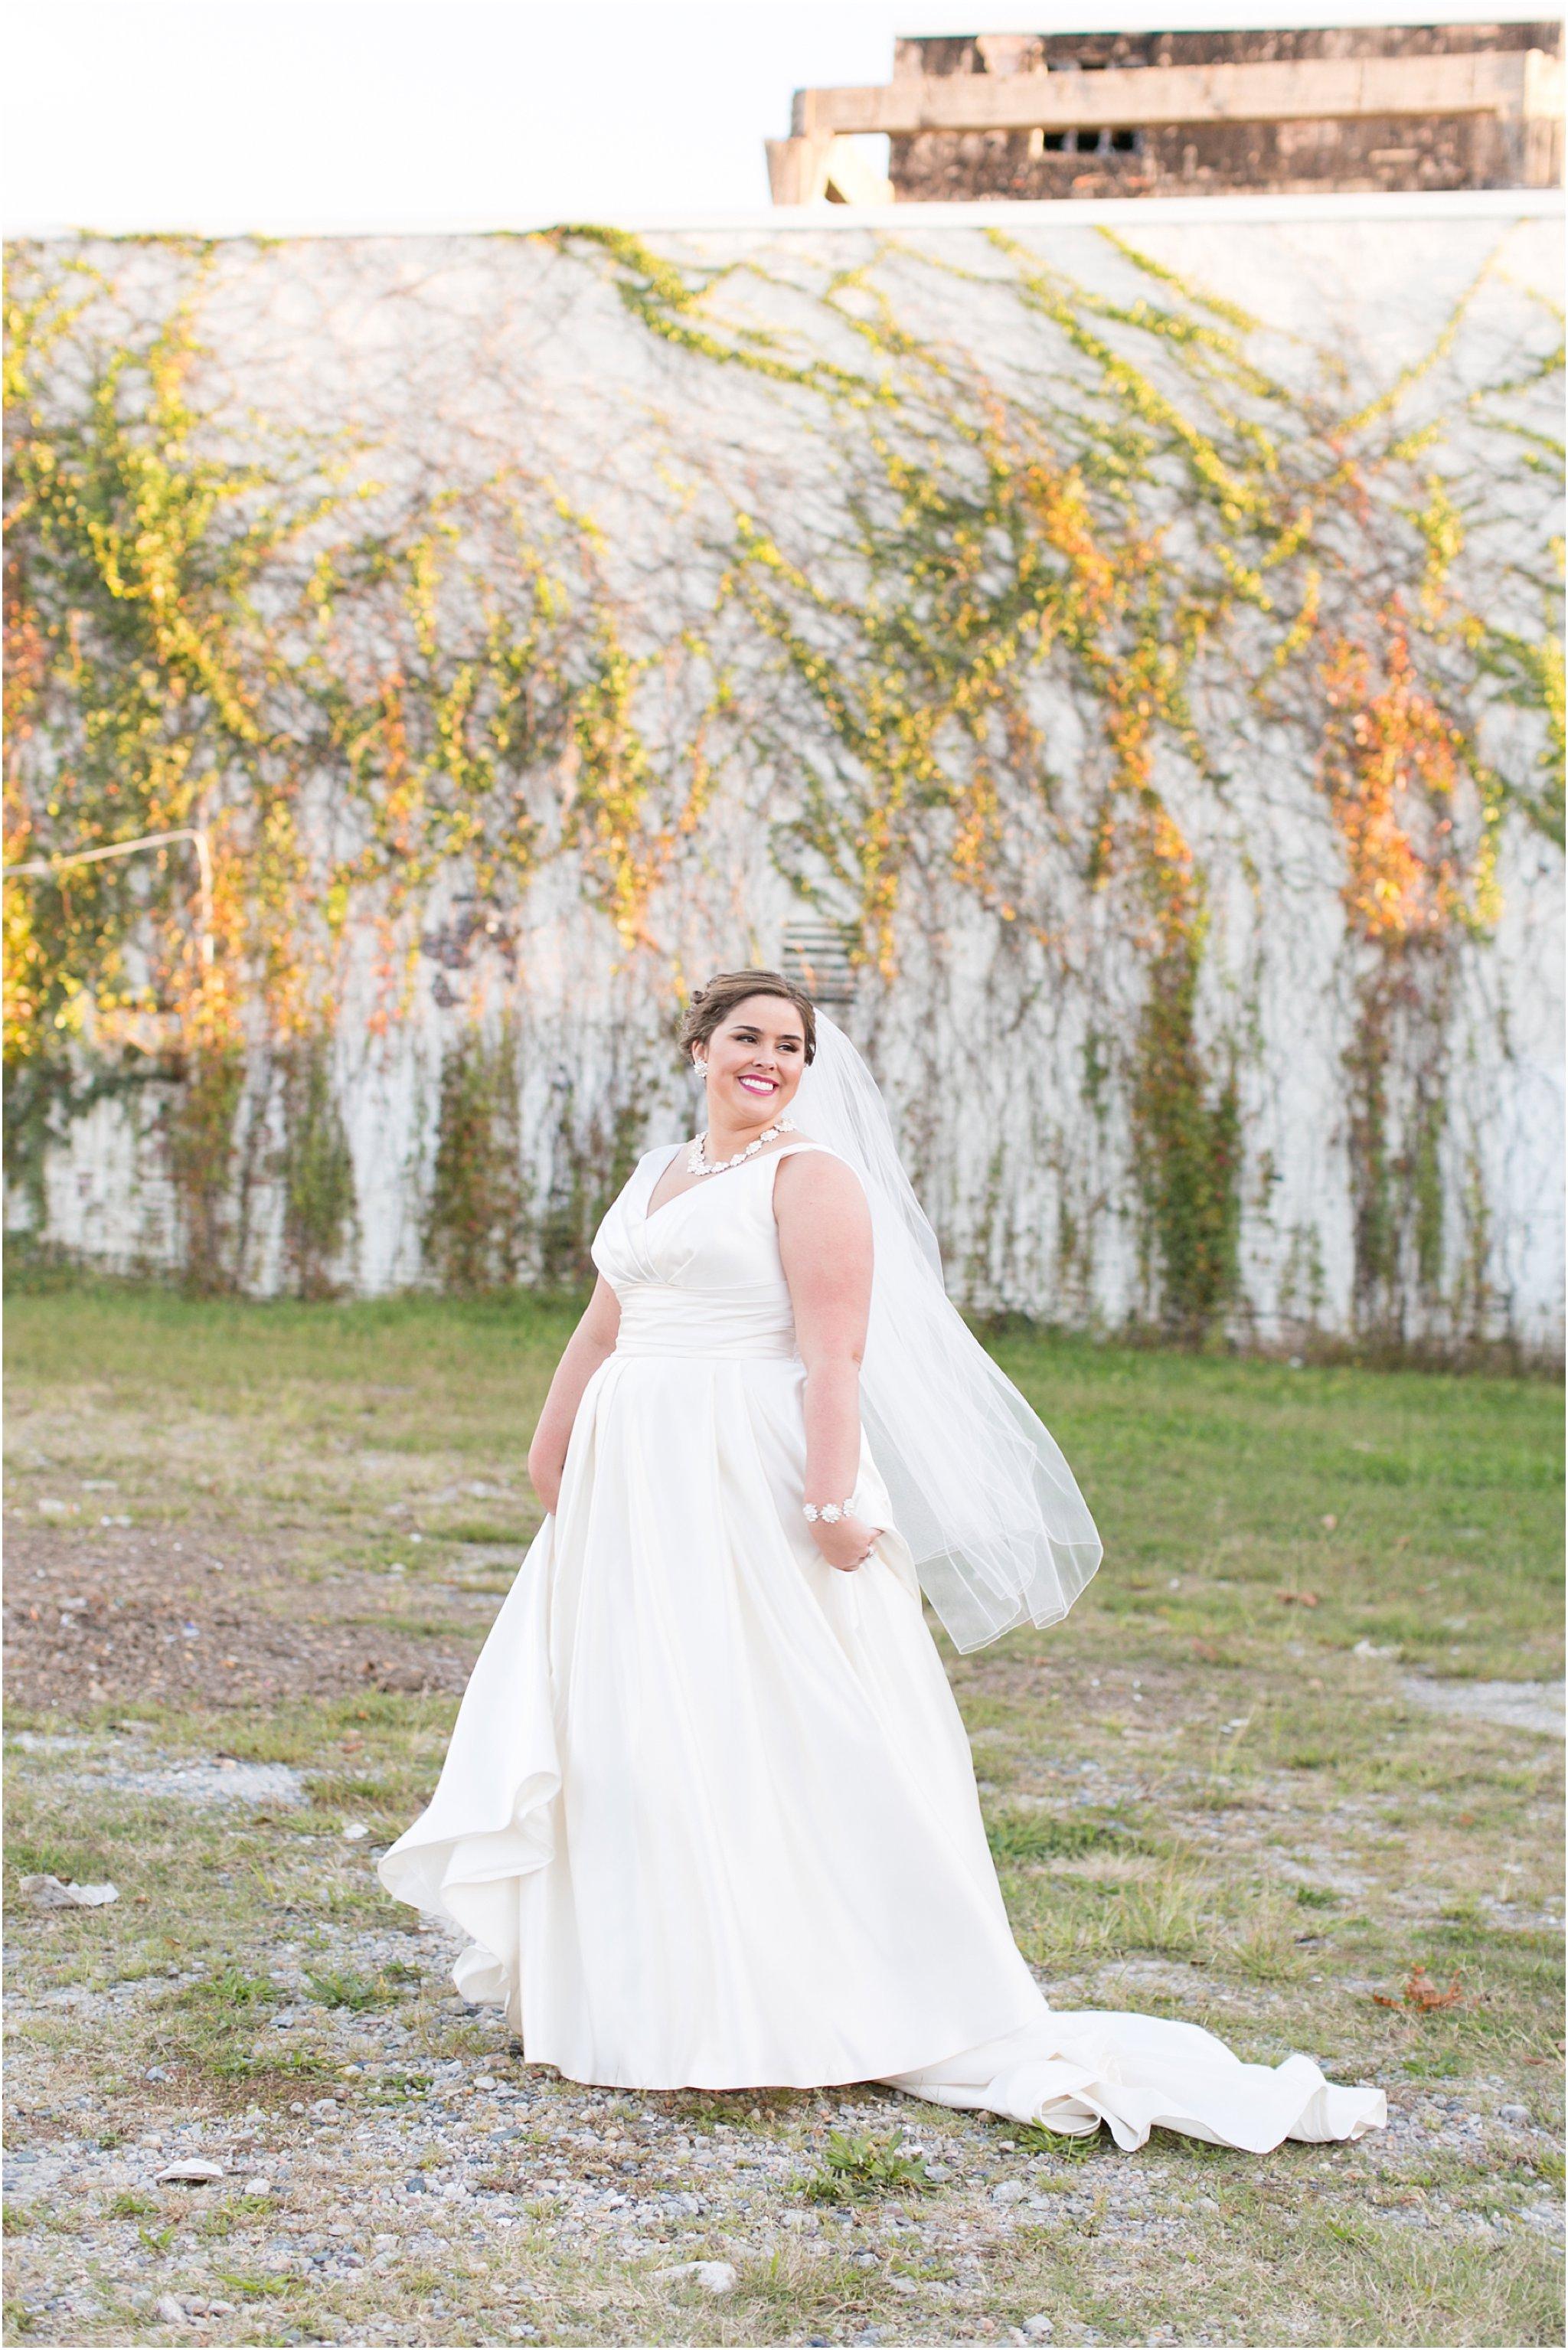 va_jessica_ryan_photography_virginia_wedding_norfolk_harrison_opera_house_norfolk_arts_district_portraits_3823